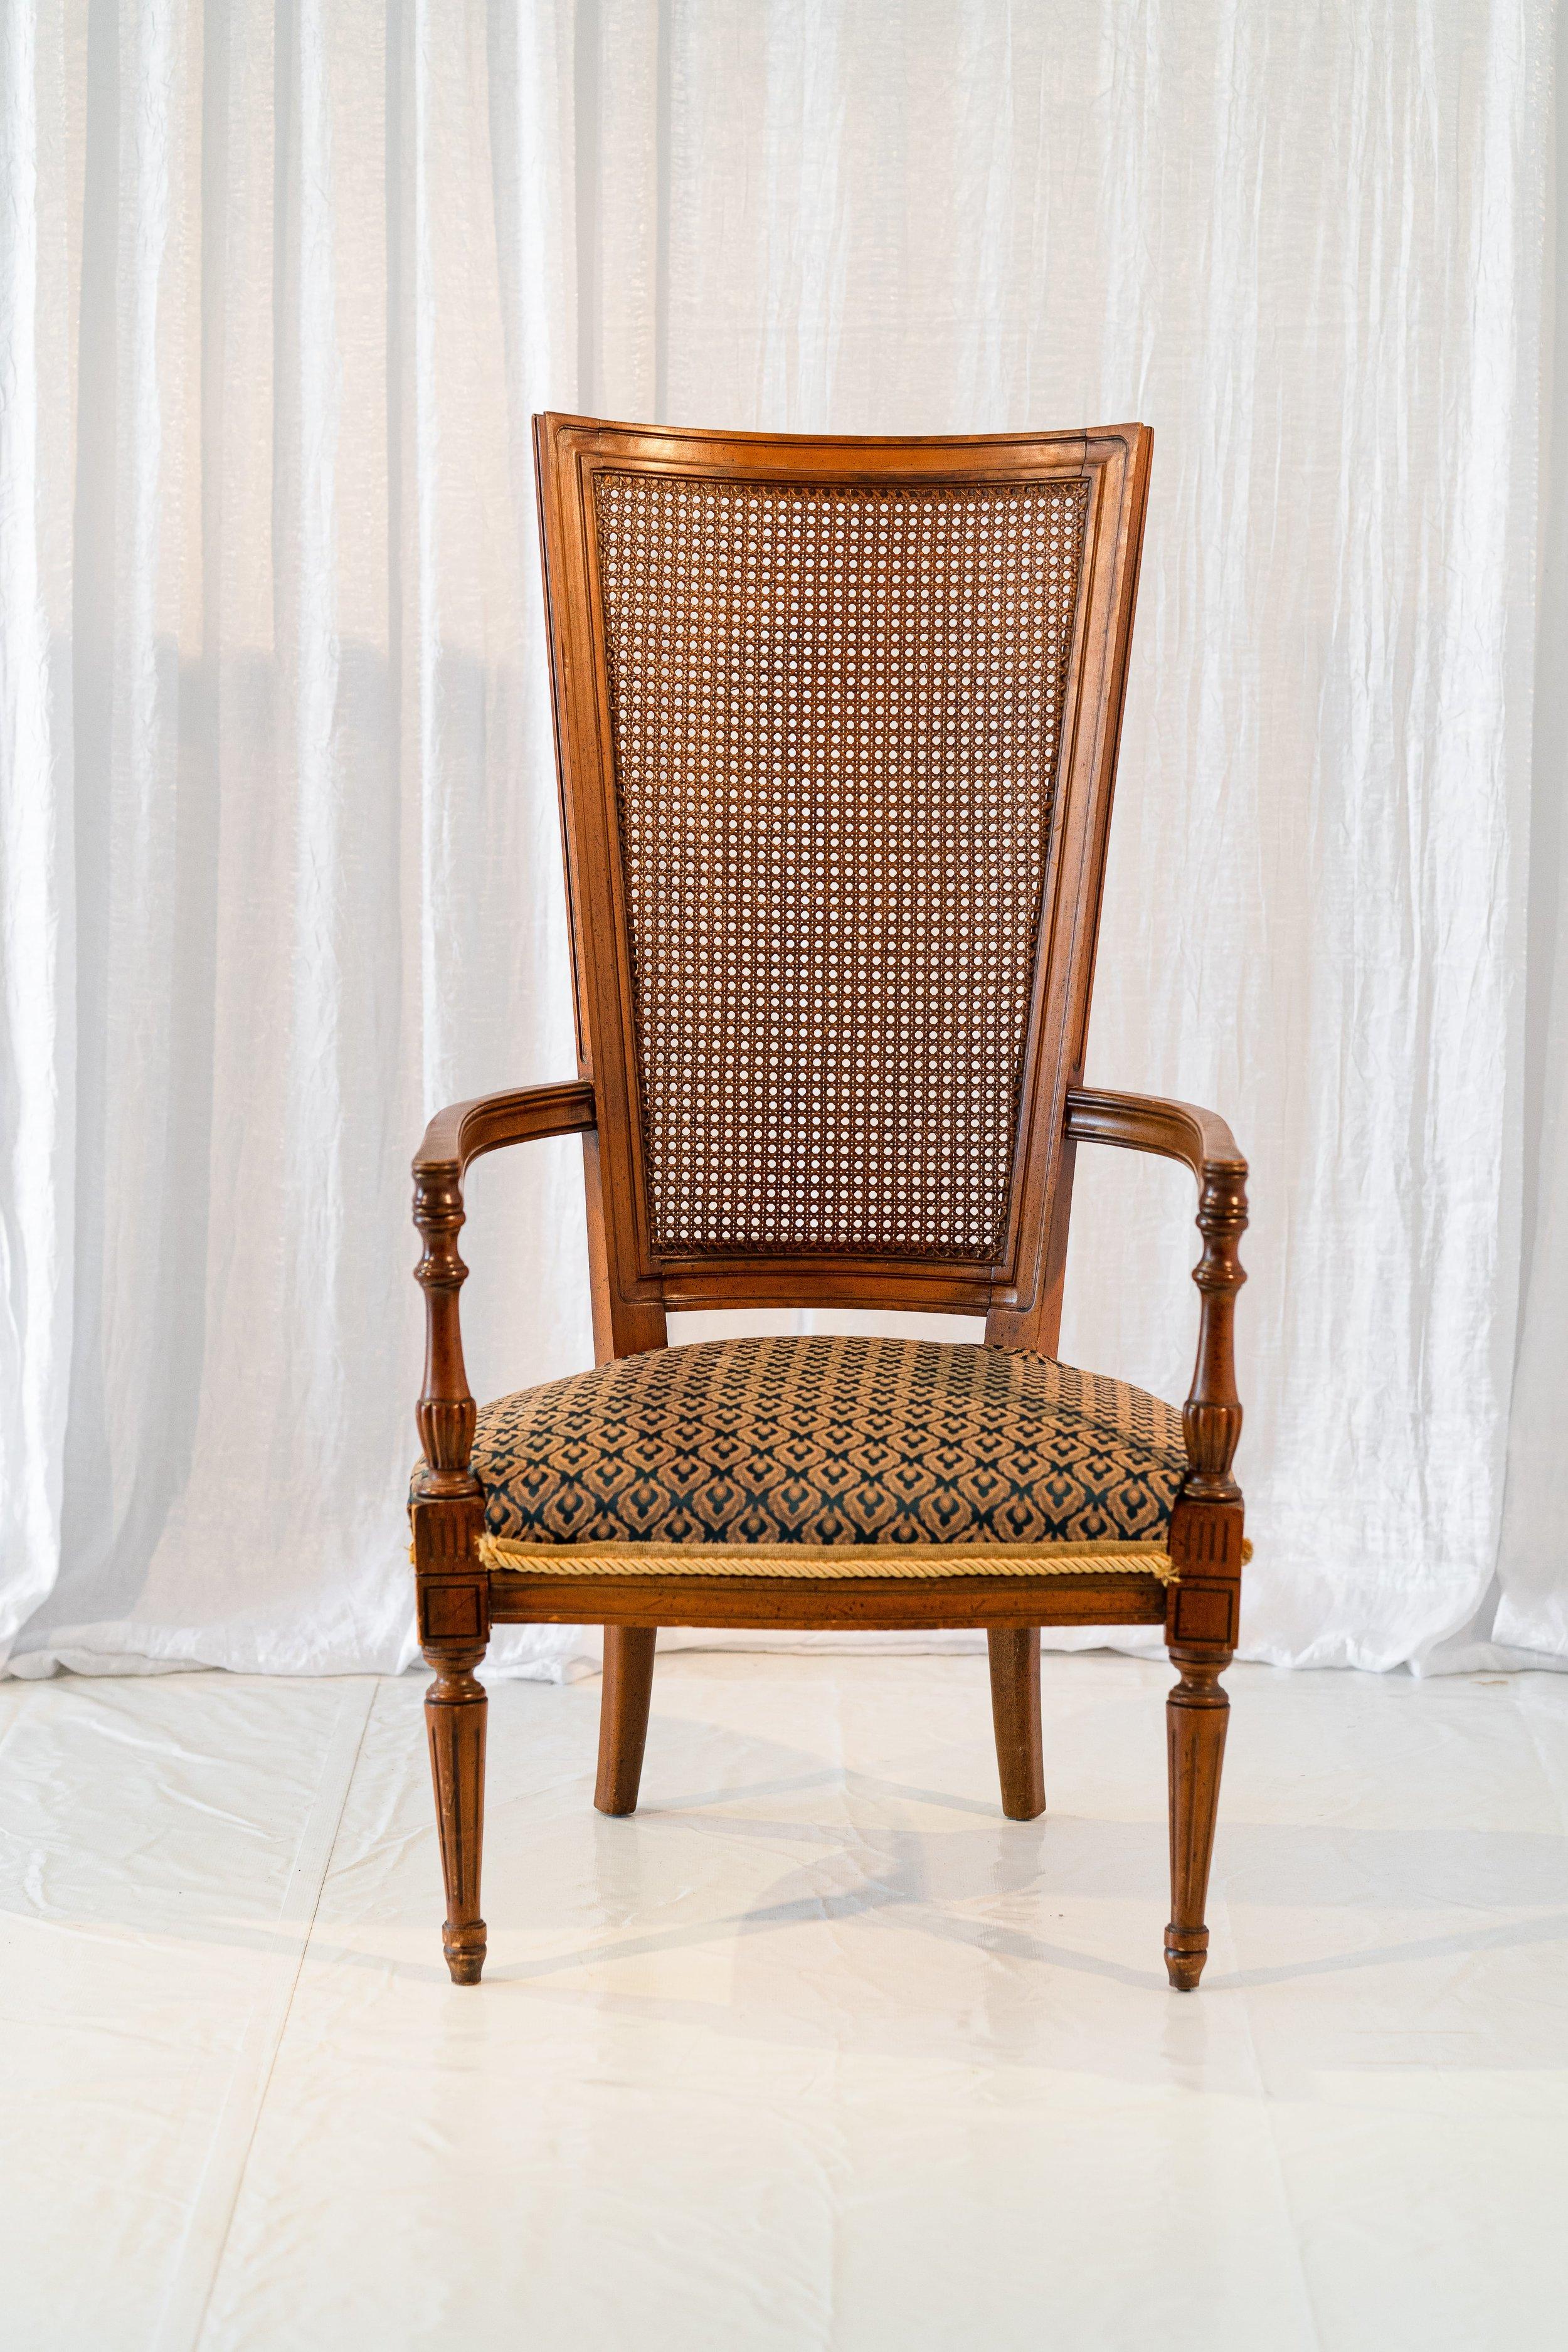 vintage chair images2-7-min.jpg